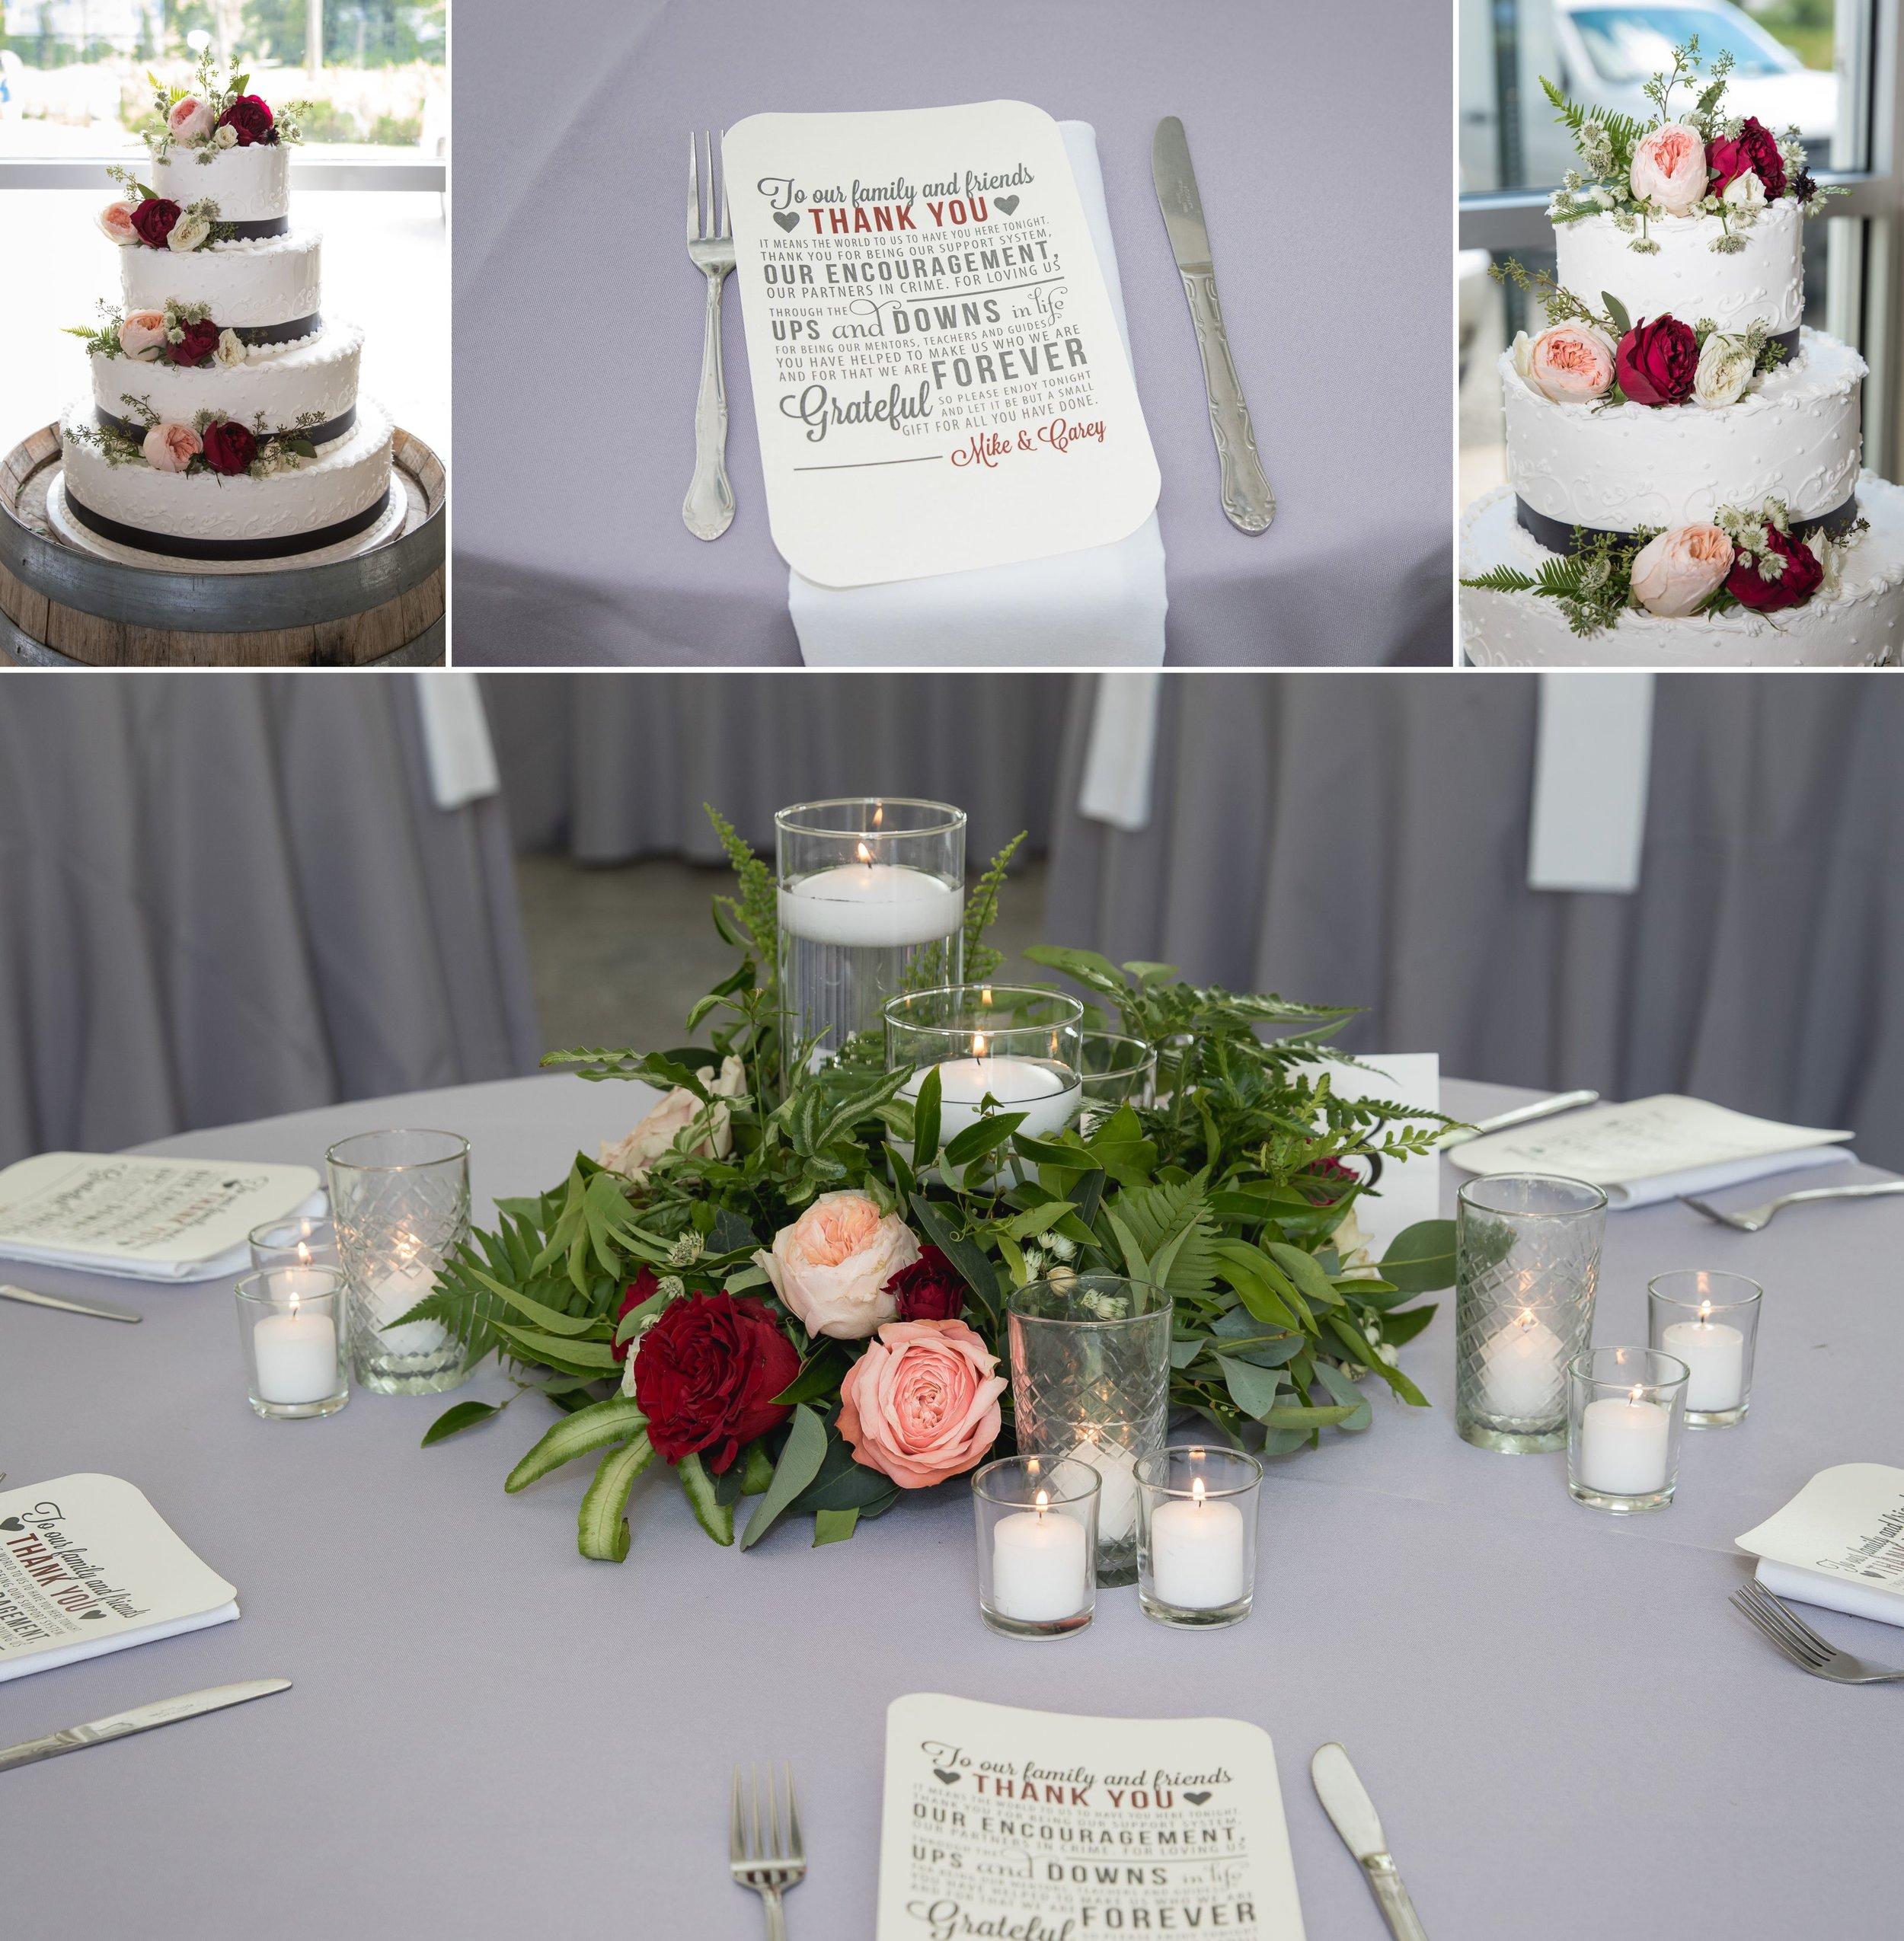 016-Buckeye-lake-winery-wedding-venue-columbus-ohio-wedding-muschlitz-photography-reception-01.JPG